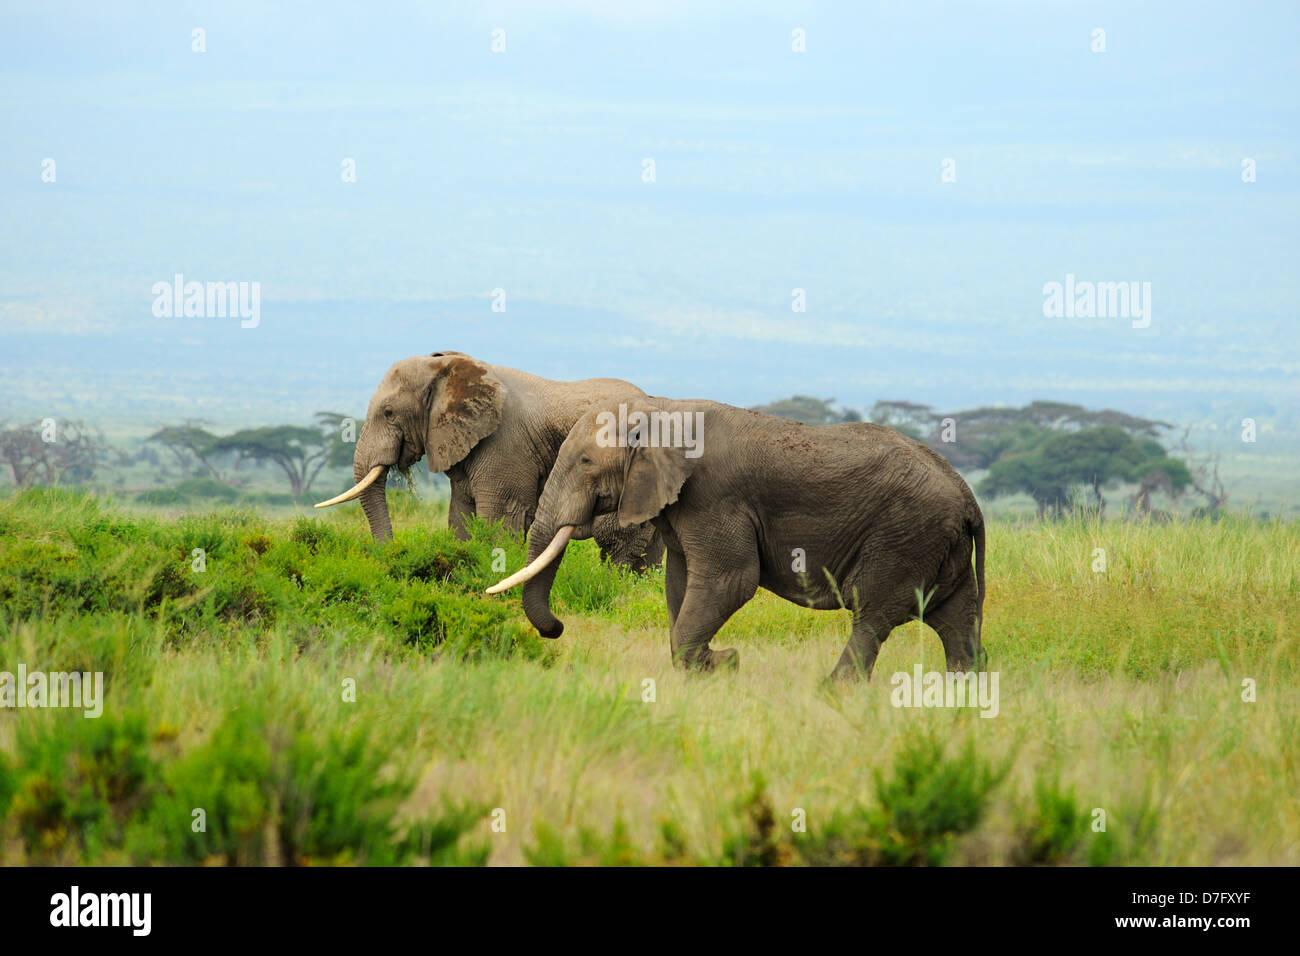 Elephants in Amboseli National Park, Kenya, East Africa - Stock Image